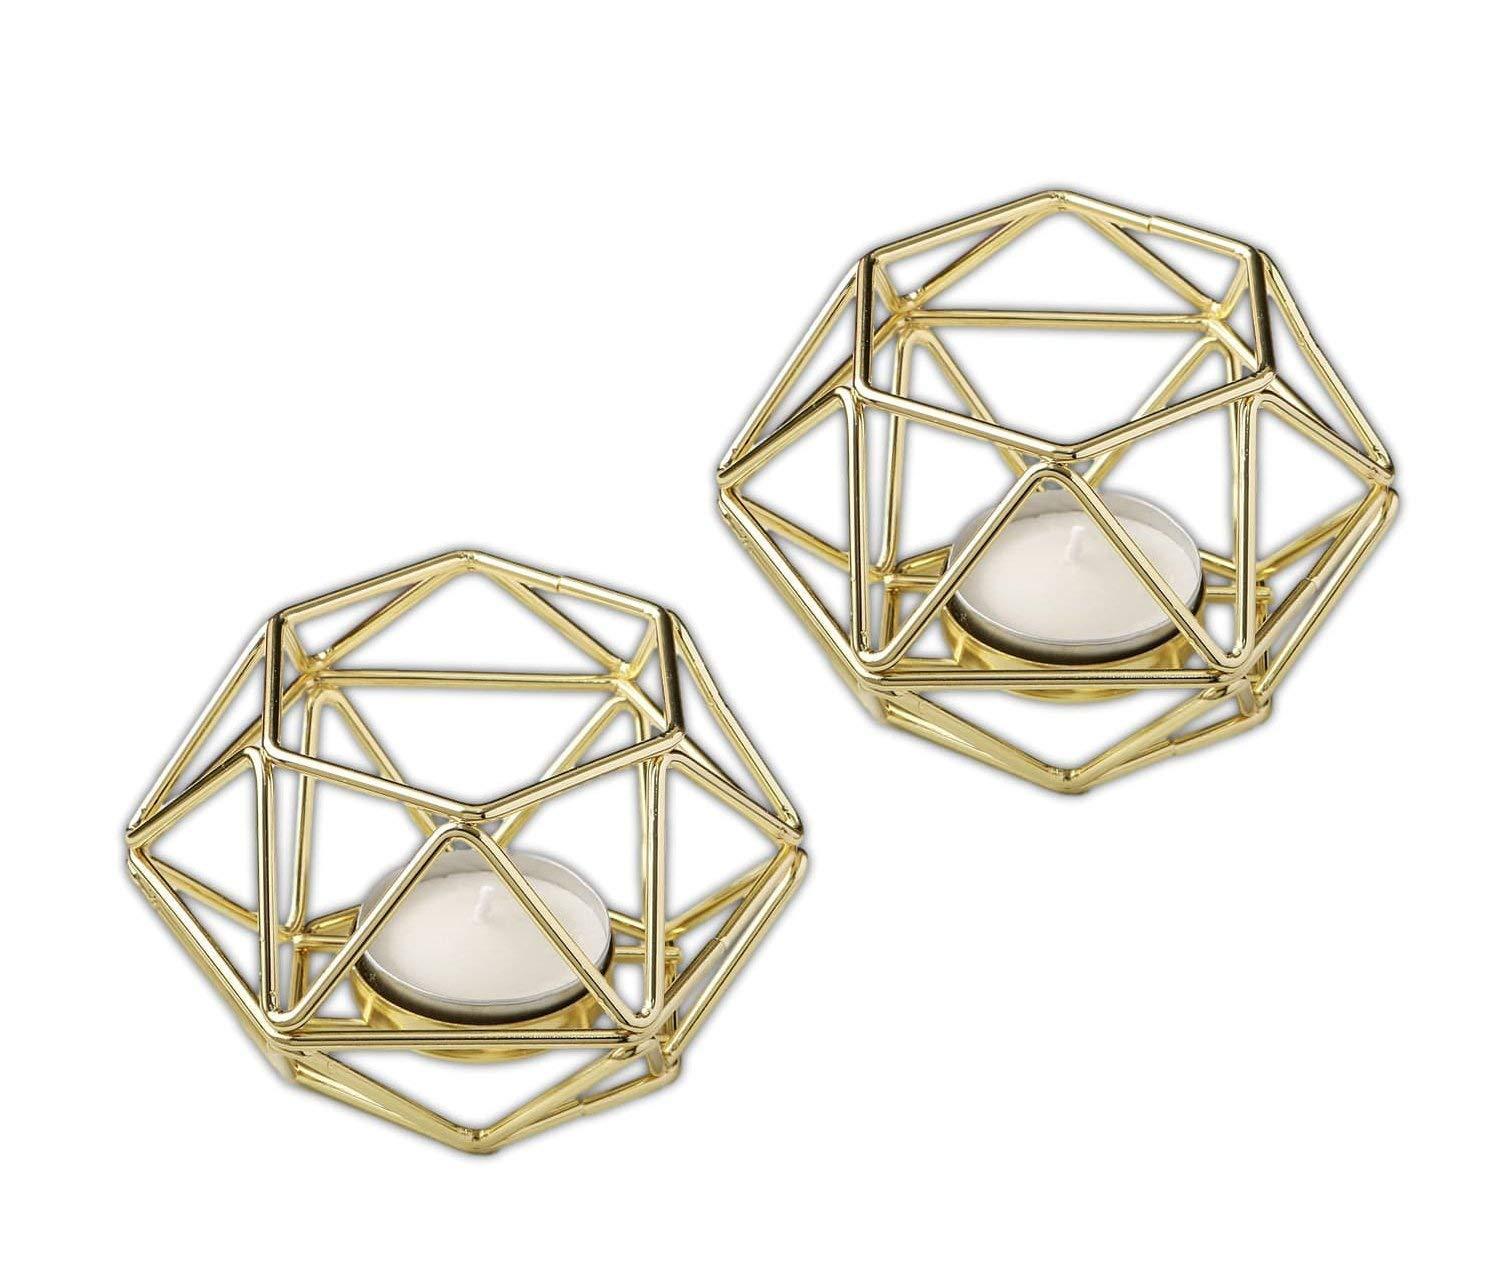 72 Gold Hexagon Shaped Geometric Design Tea Light Votive Candle Holders